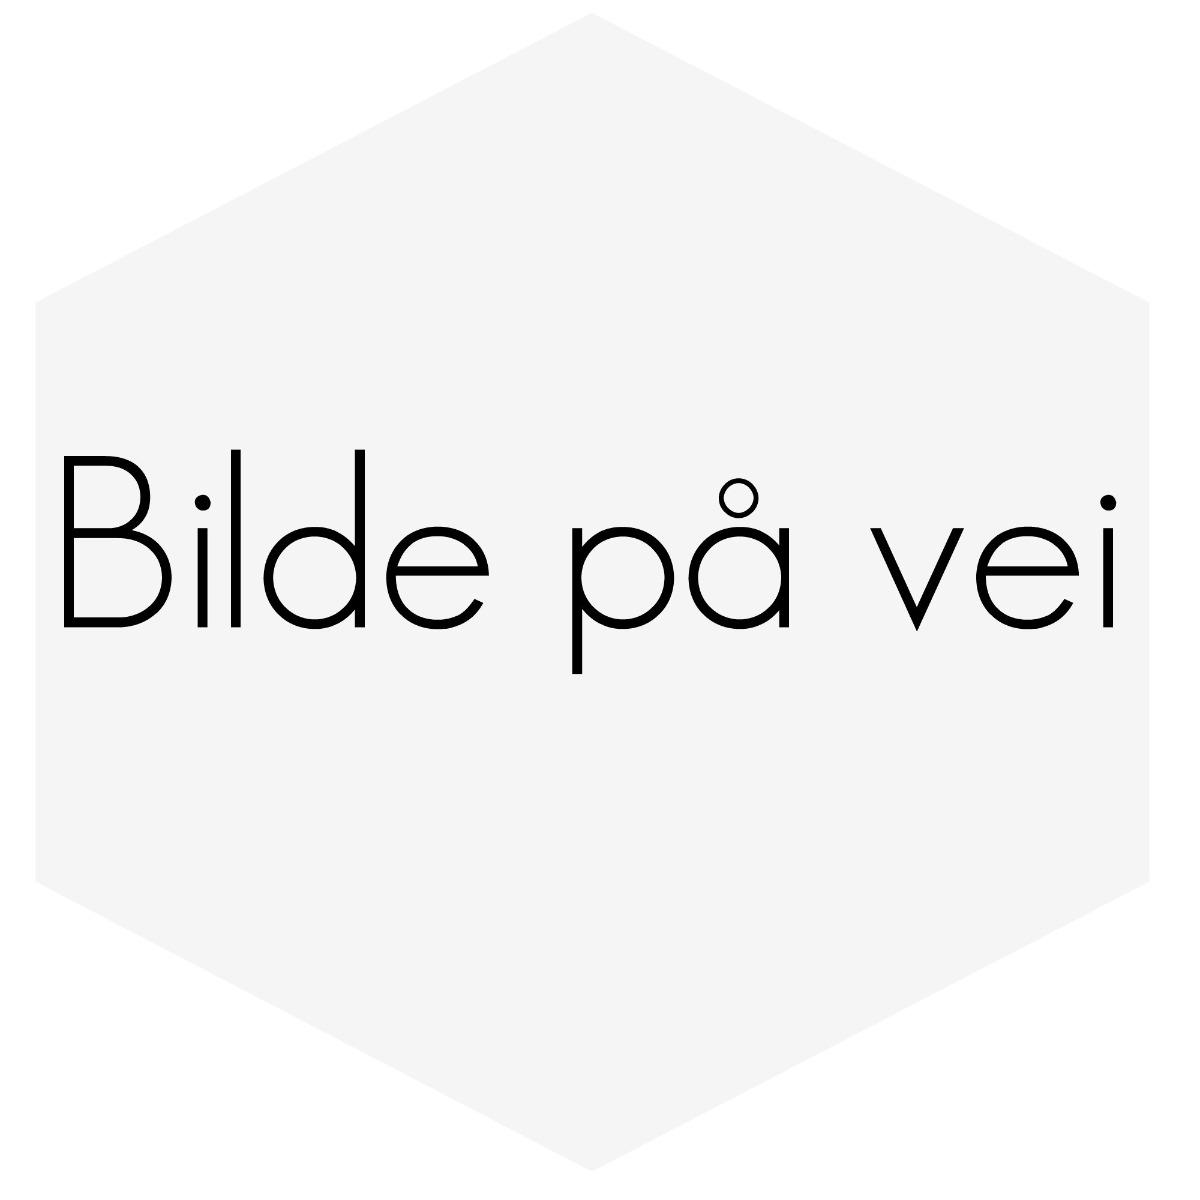 "SILIKONSLANGE RØD REDUSERING 2,375-3,125"" (60-80MM)"